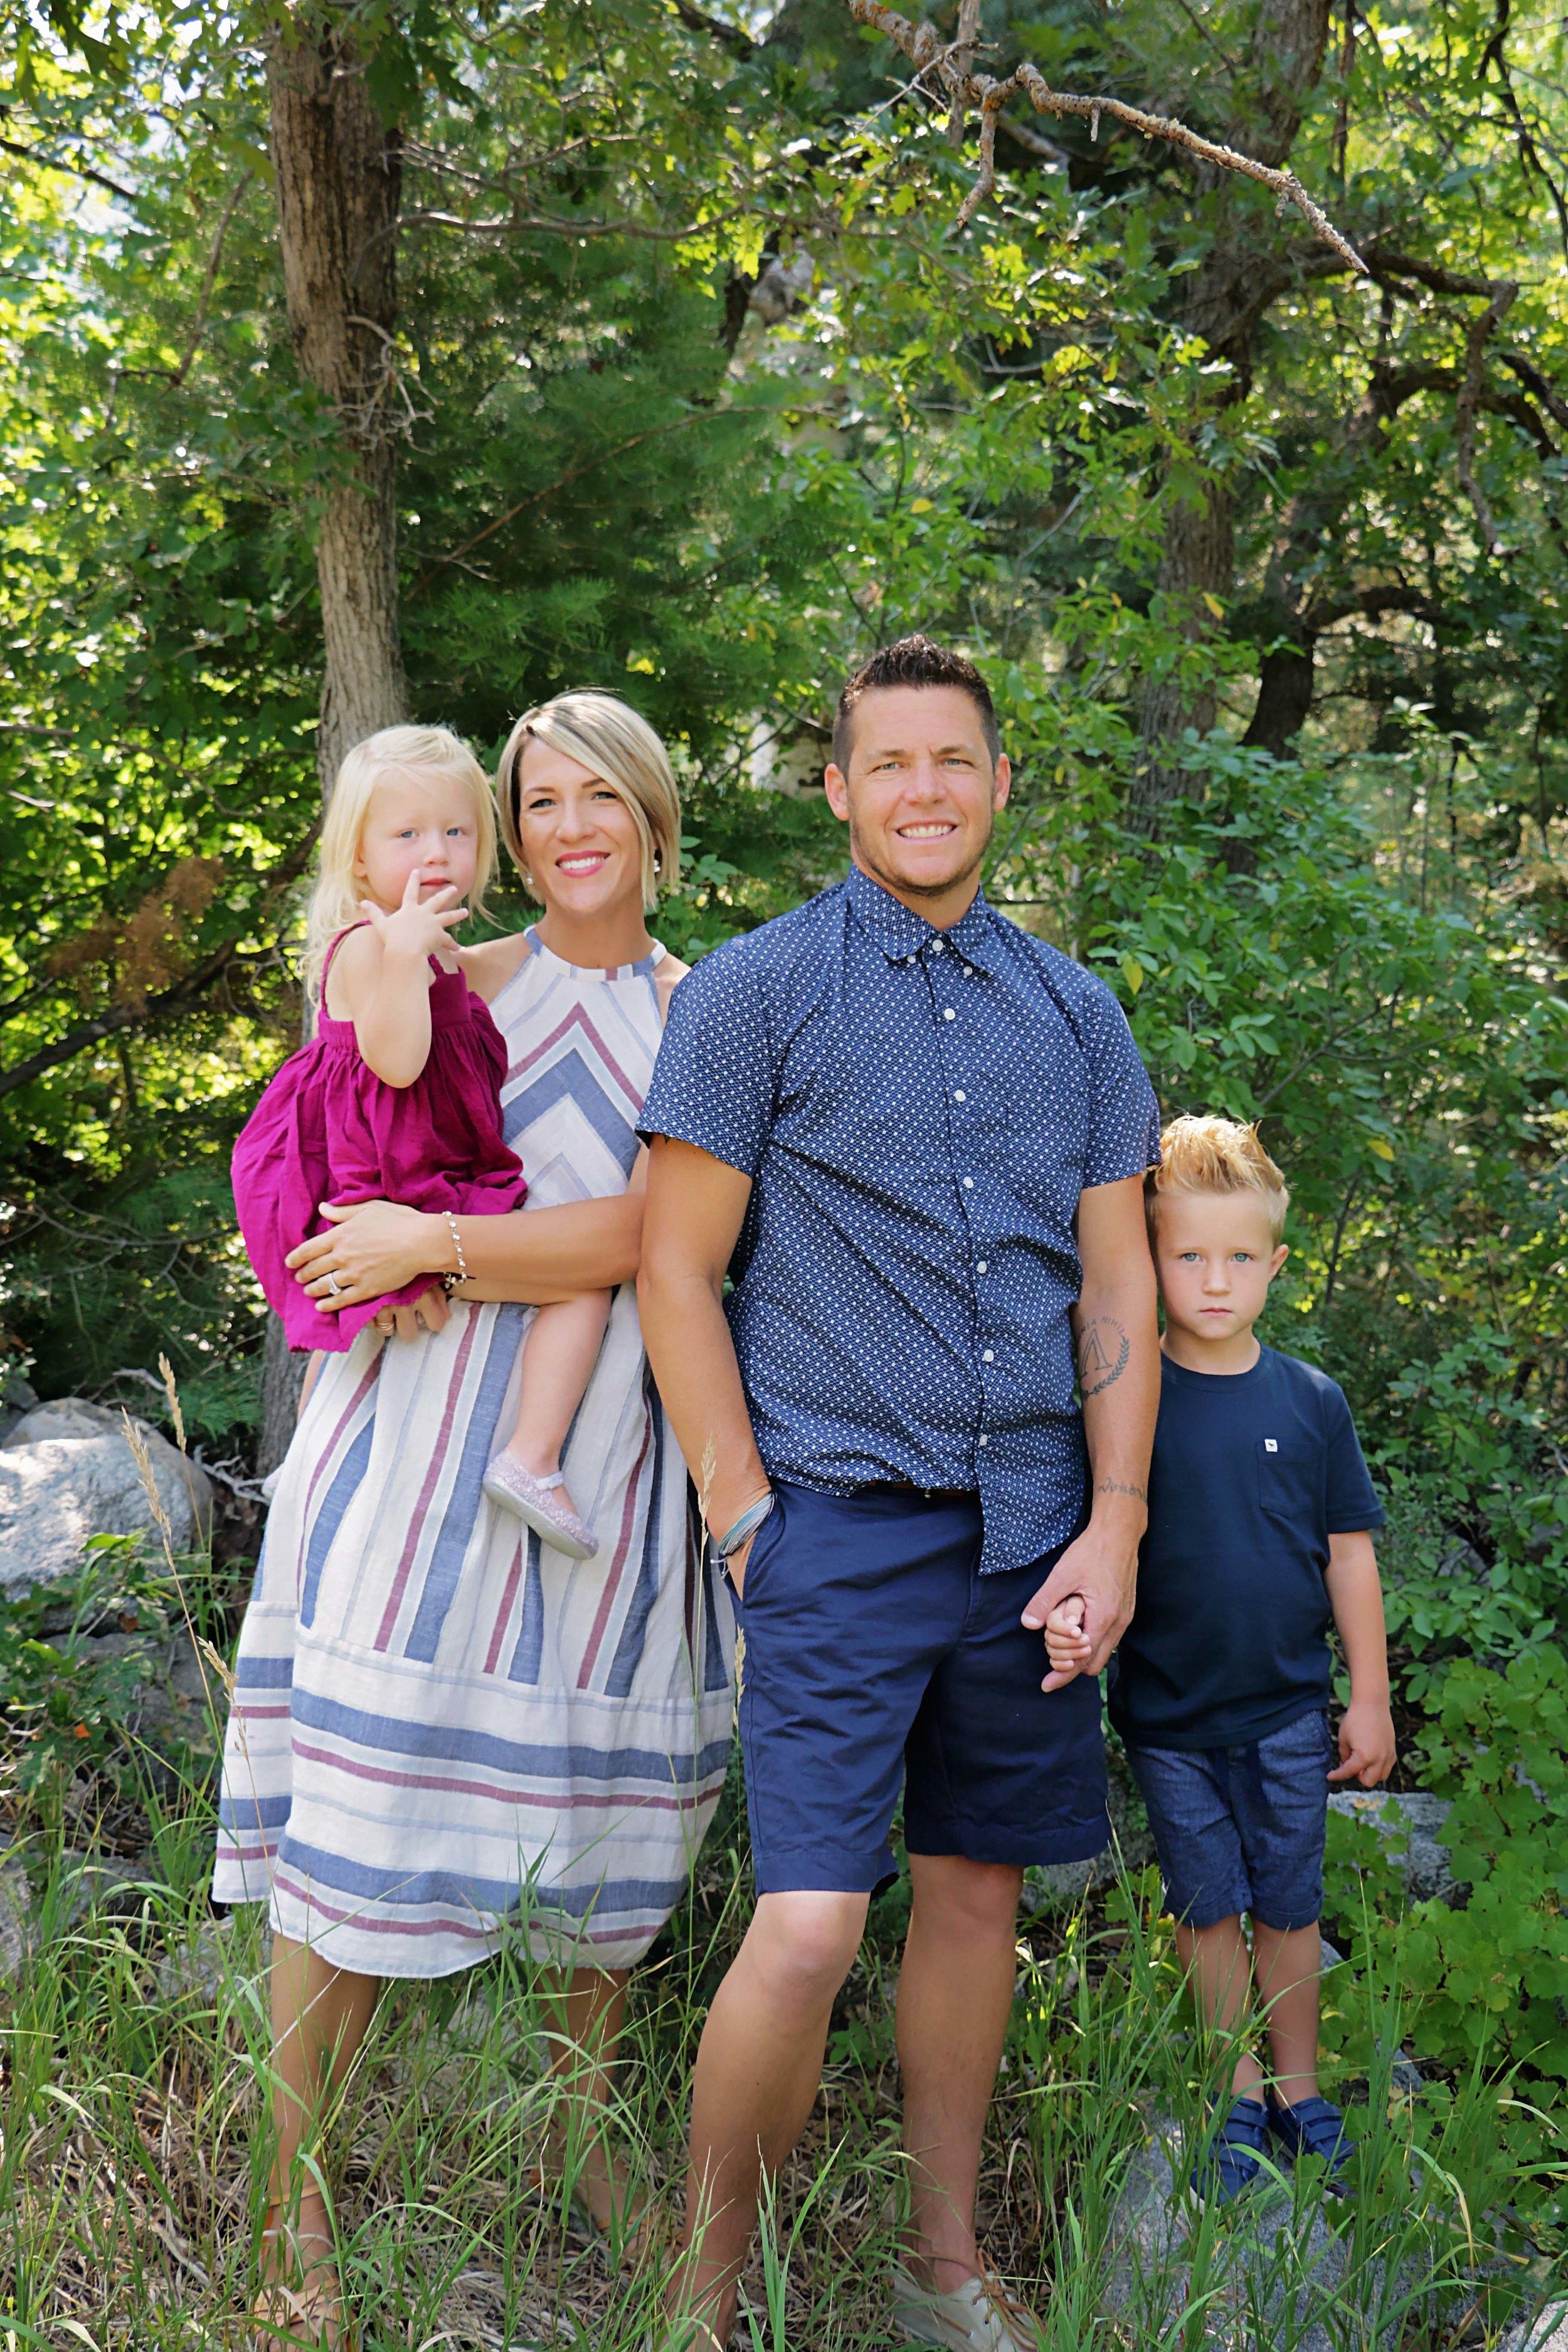 familypicture2676.jpg